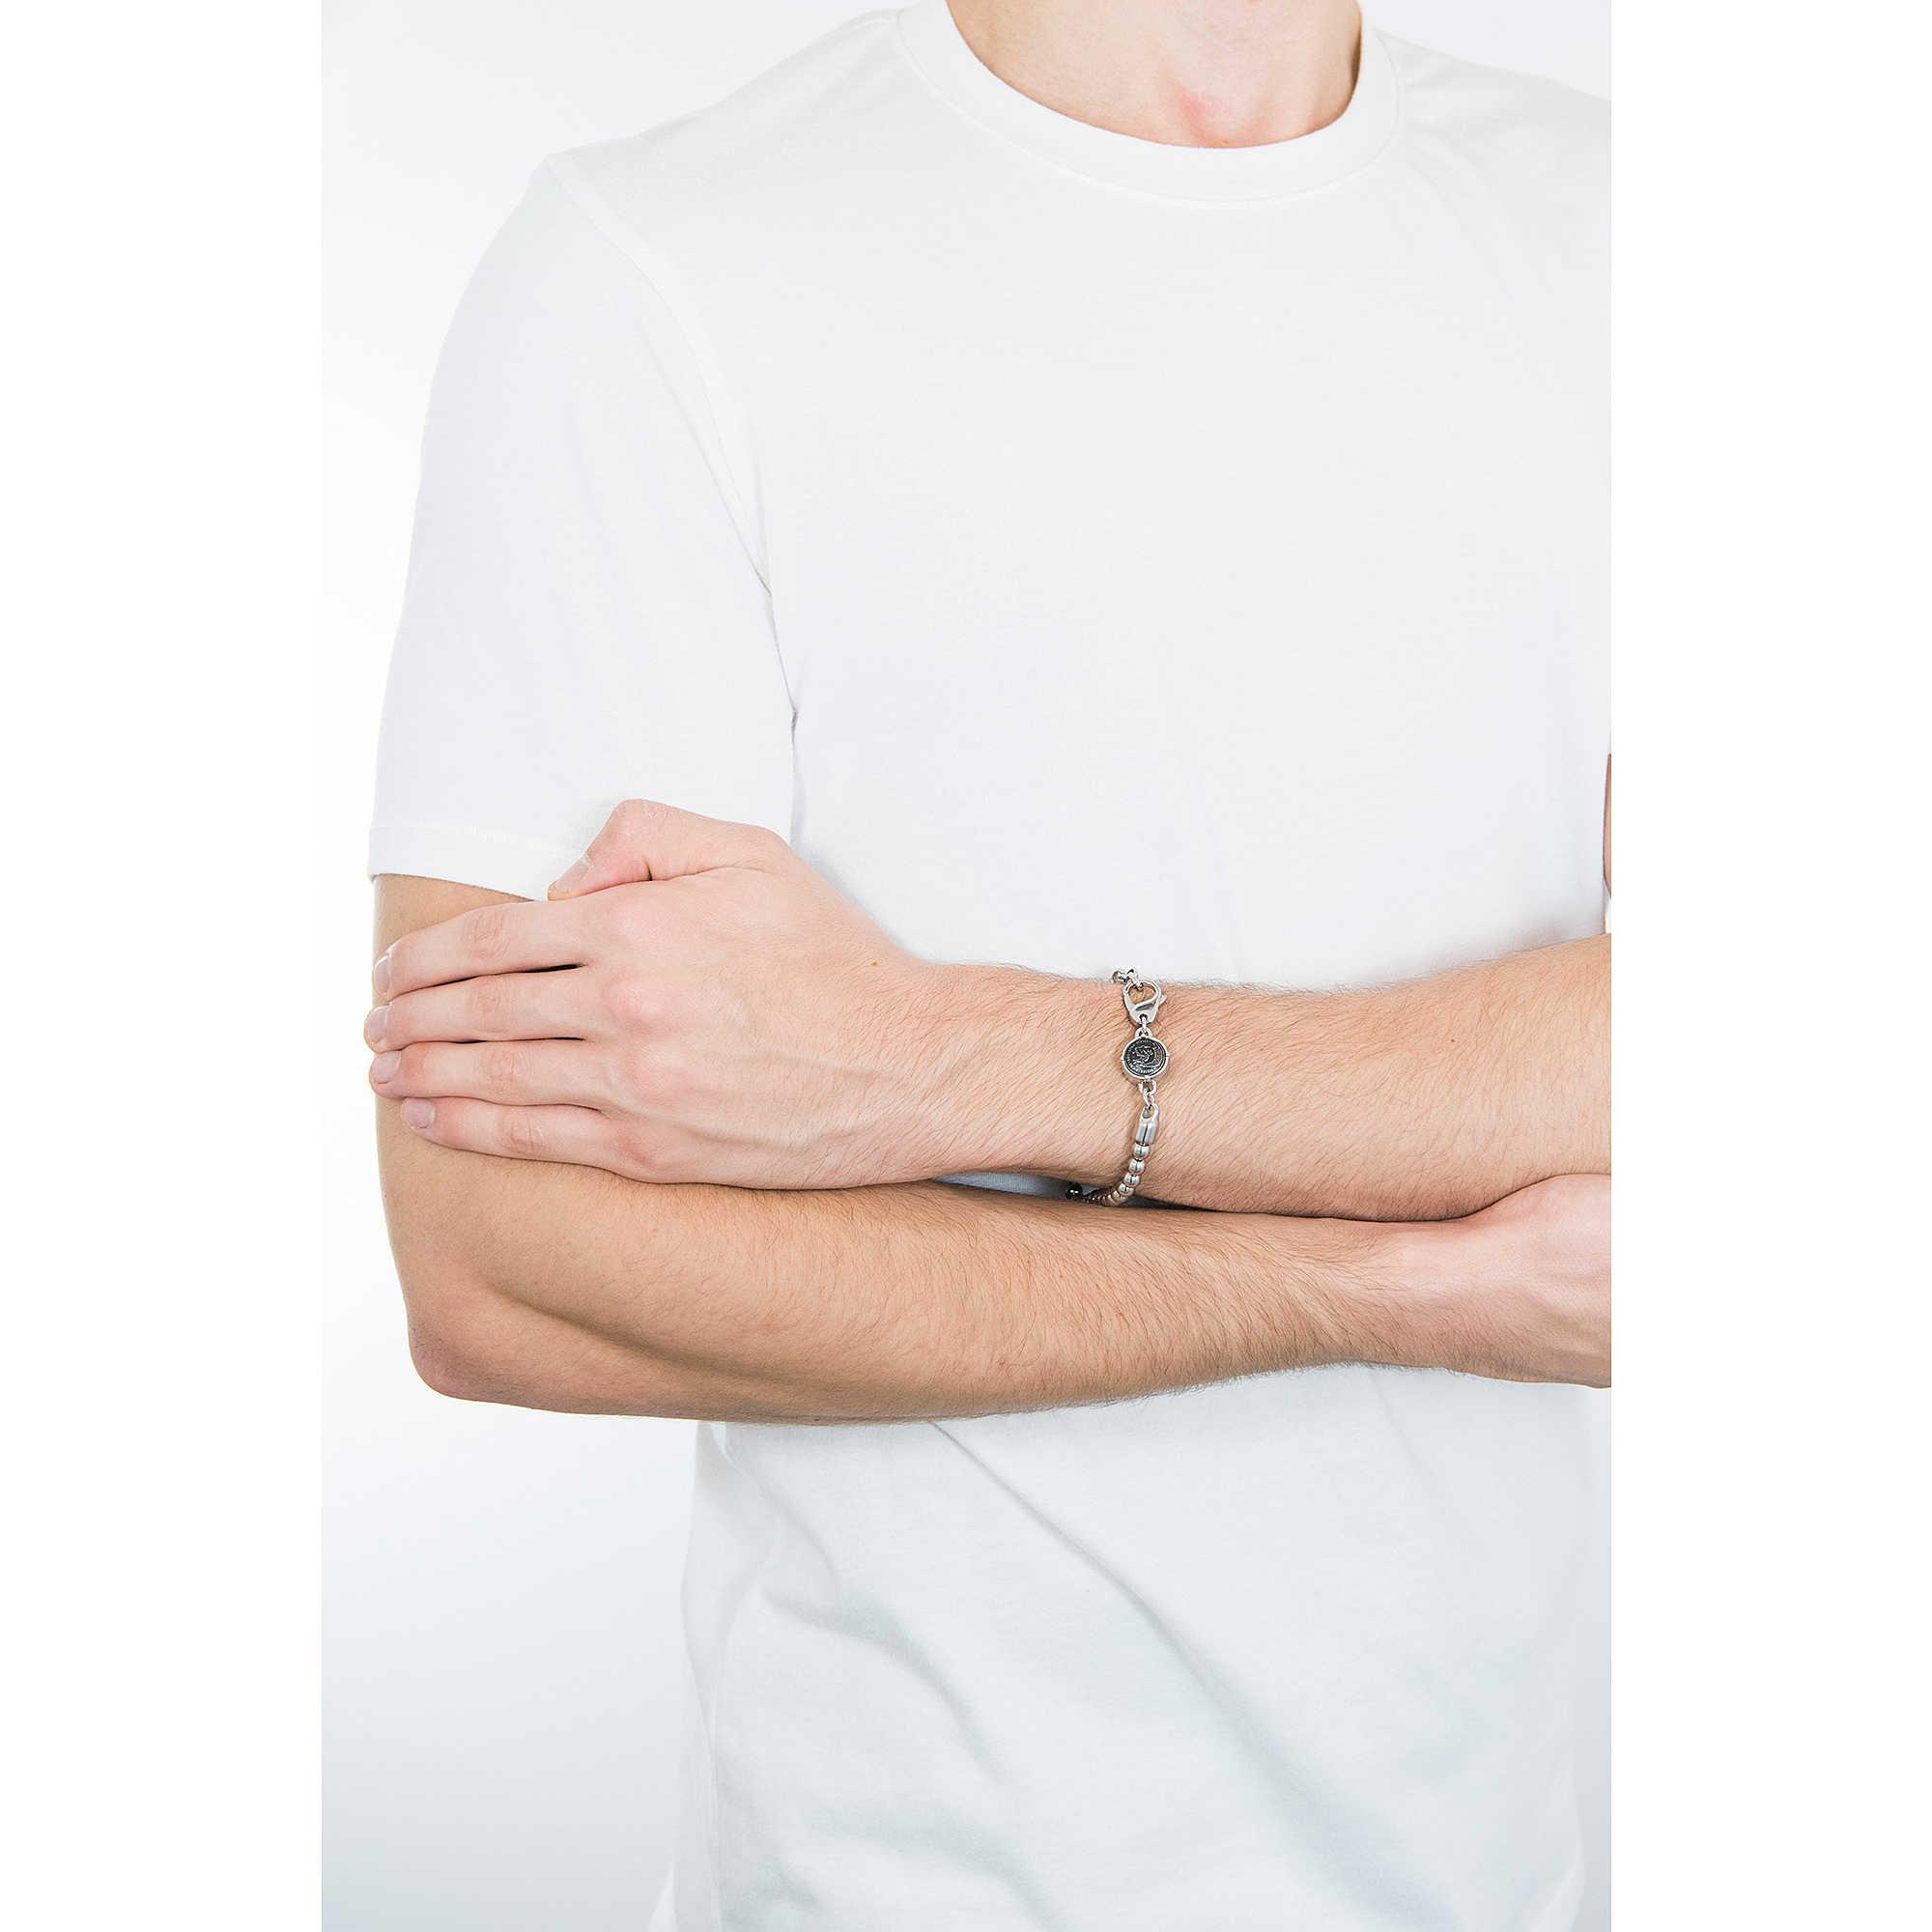 bracelet man jewellery Diesel Beads DX0930040. zoom. Diesel bracelets Beads  man DX0930040 photo wearing. zoom 167c503d1321